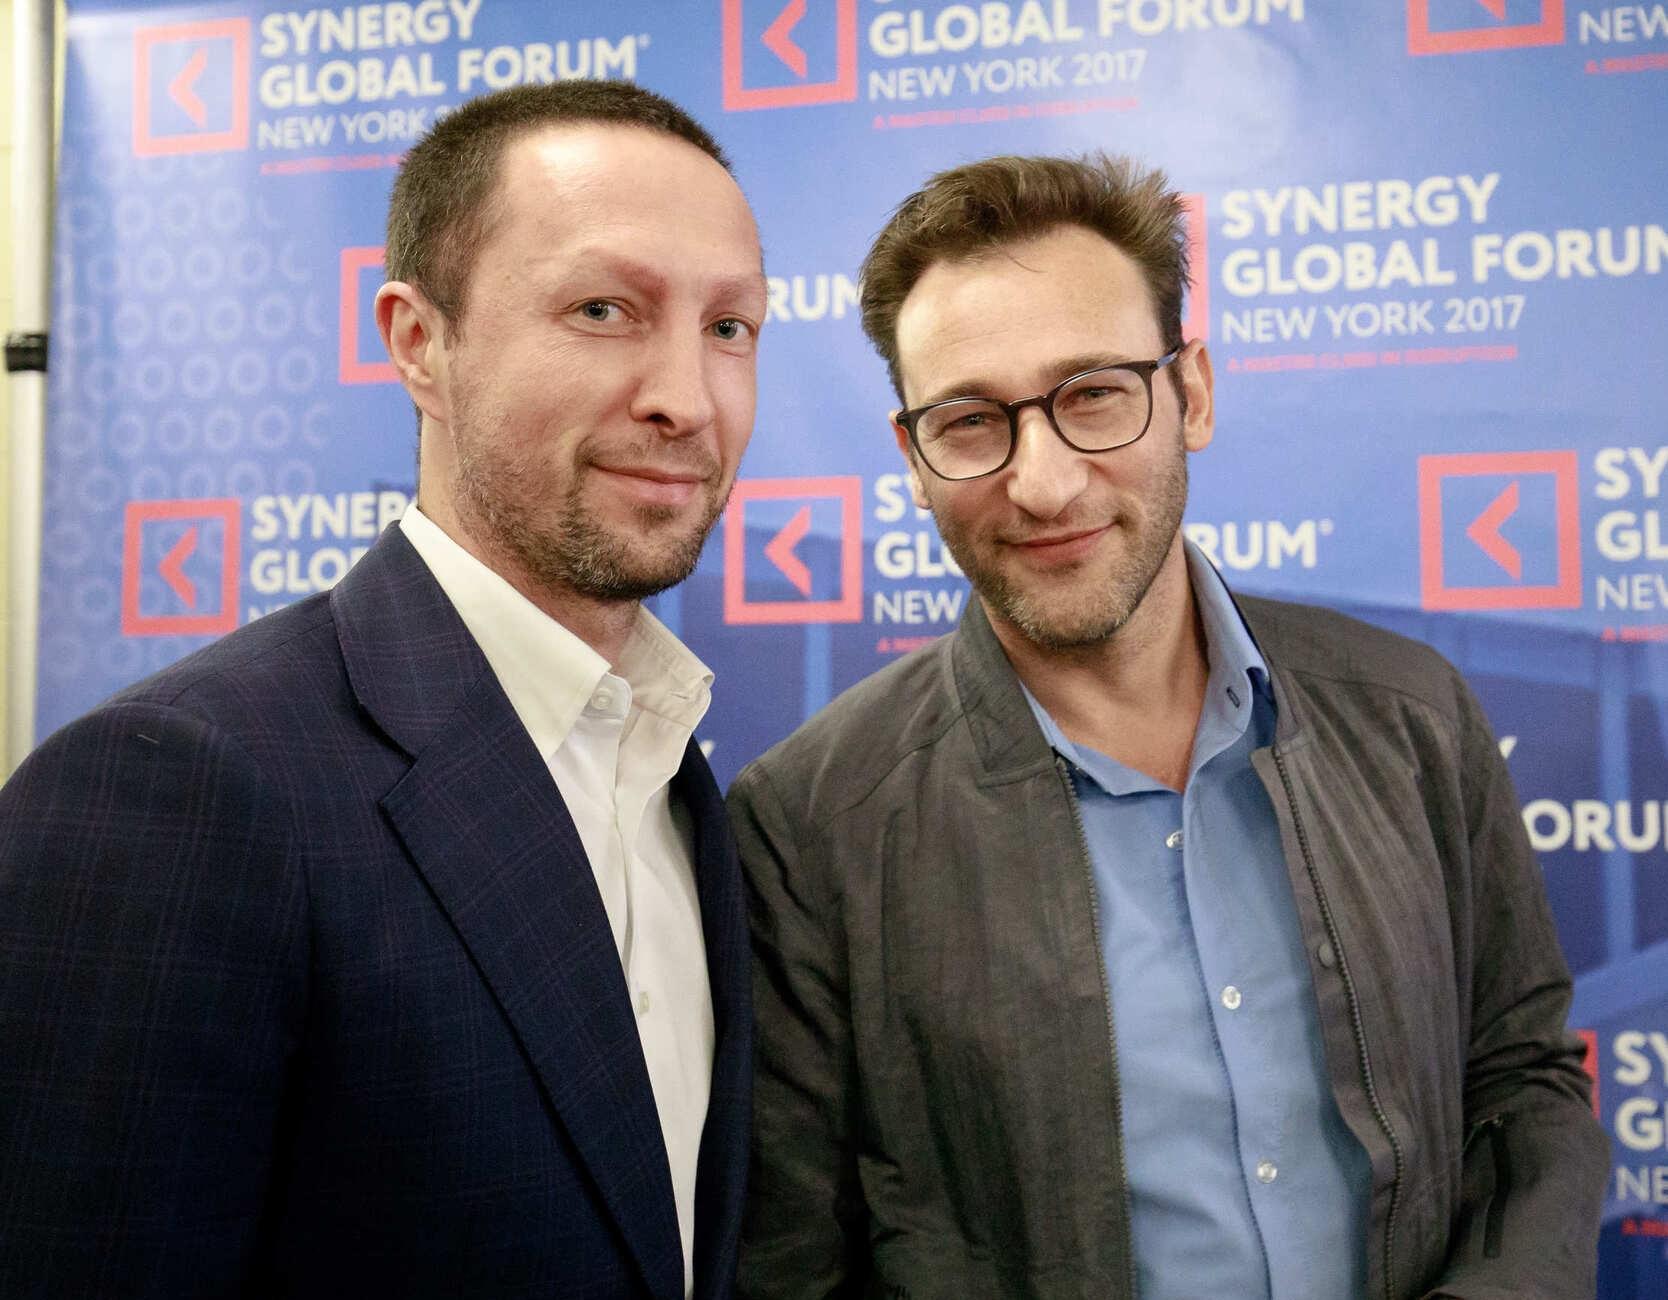 Саймон Синек на Synergy Global Forum New York